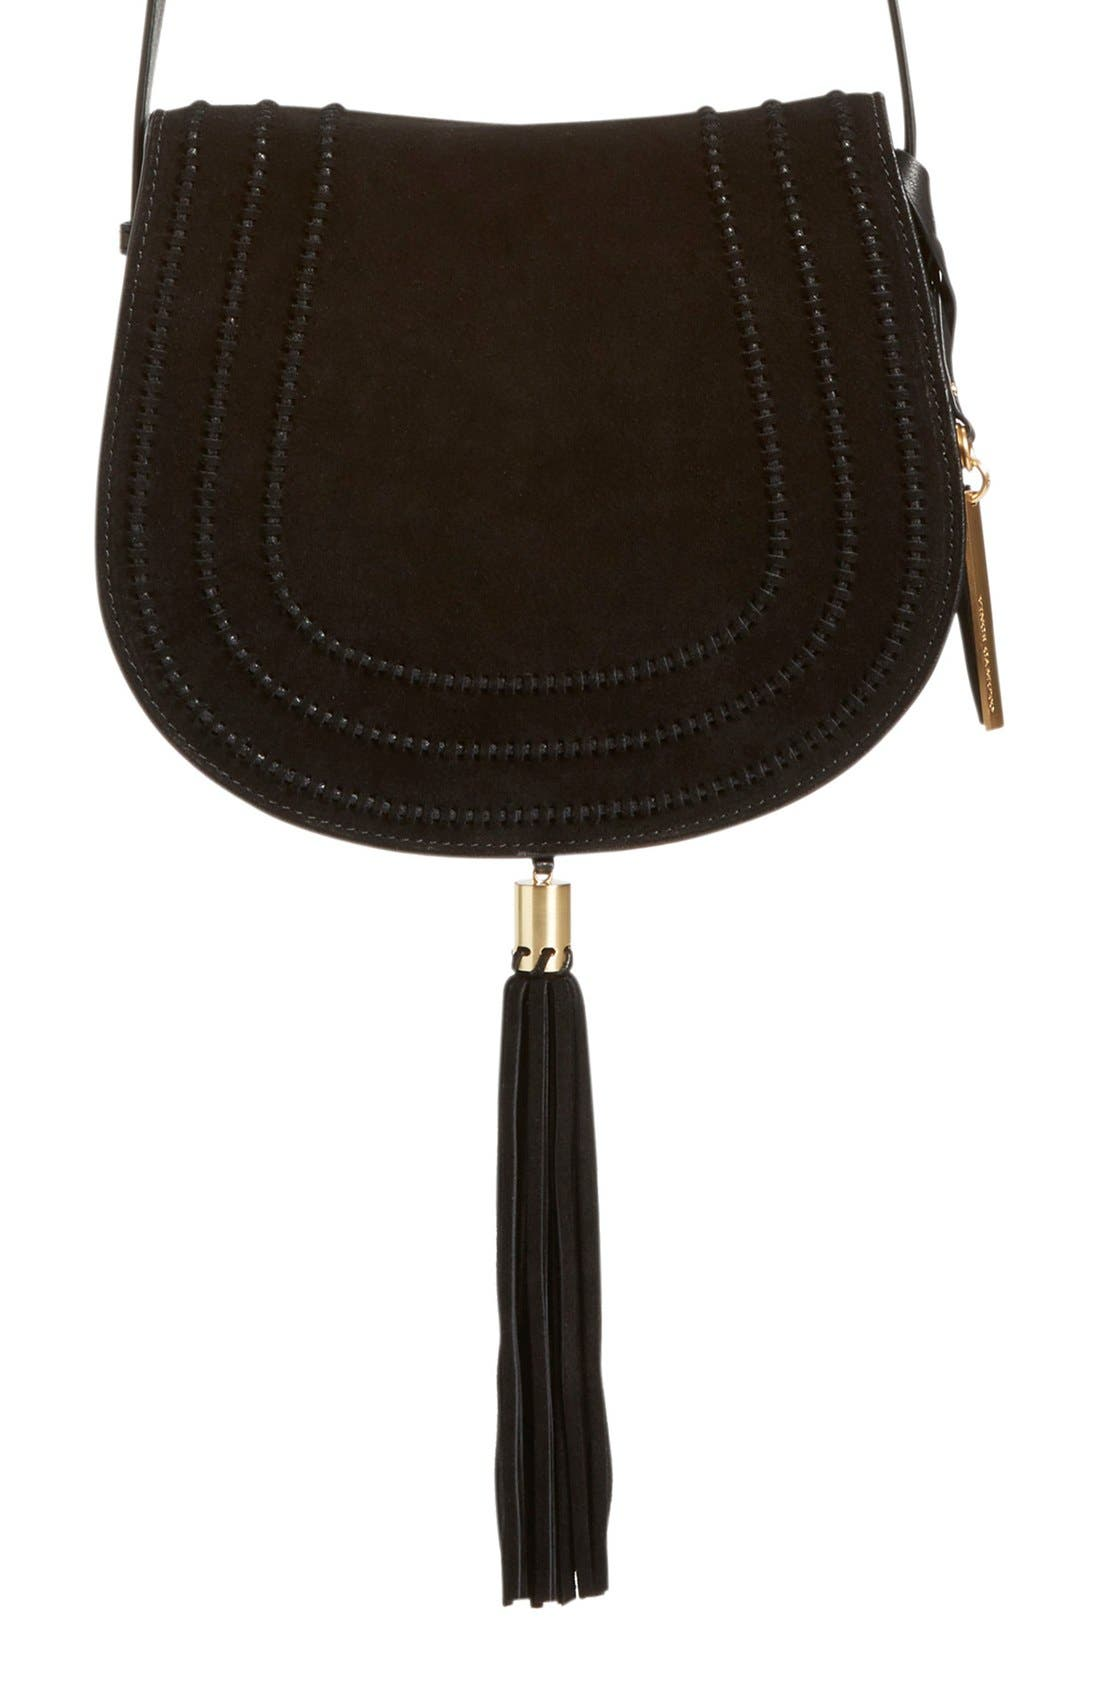 VINCE CAMUTO 'Izzi' Tassel Leather & Suede Crossbody Bag, Main, color, 001